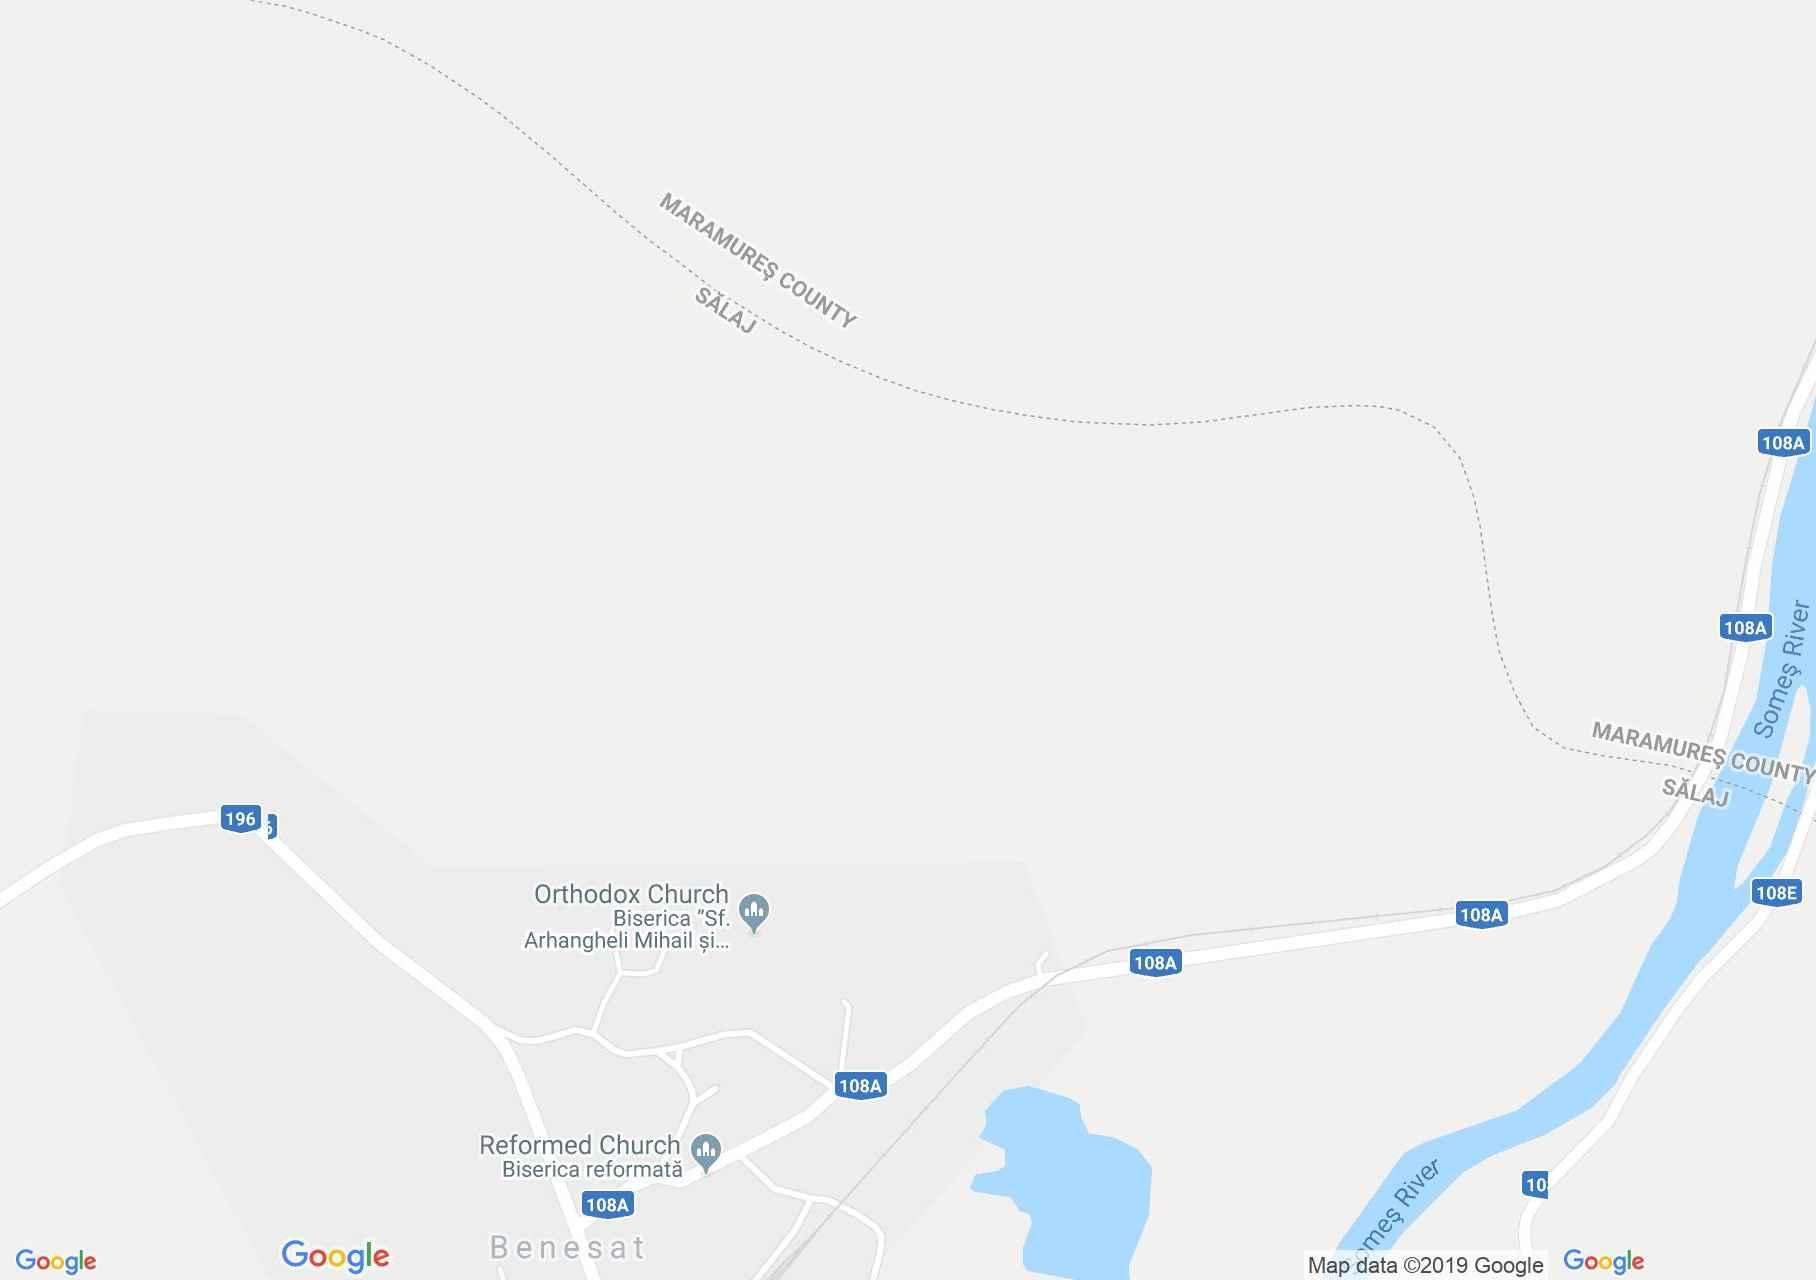 Map of Benesat: Orthodox church